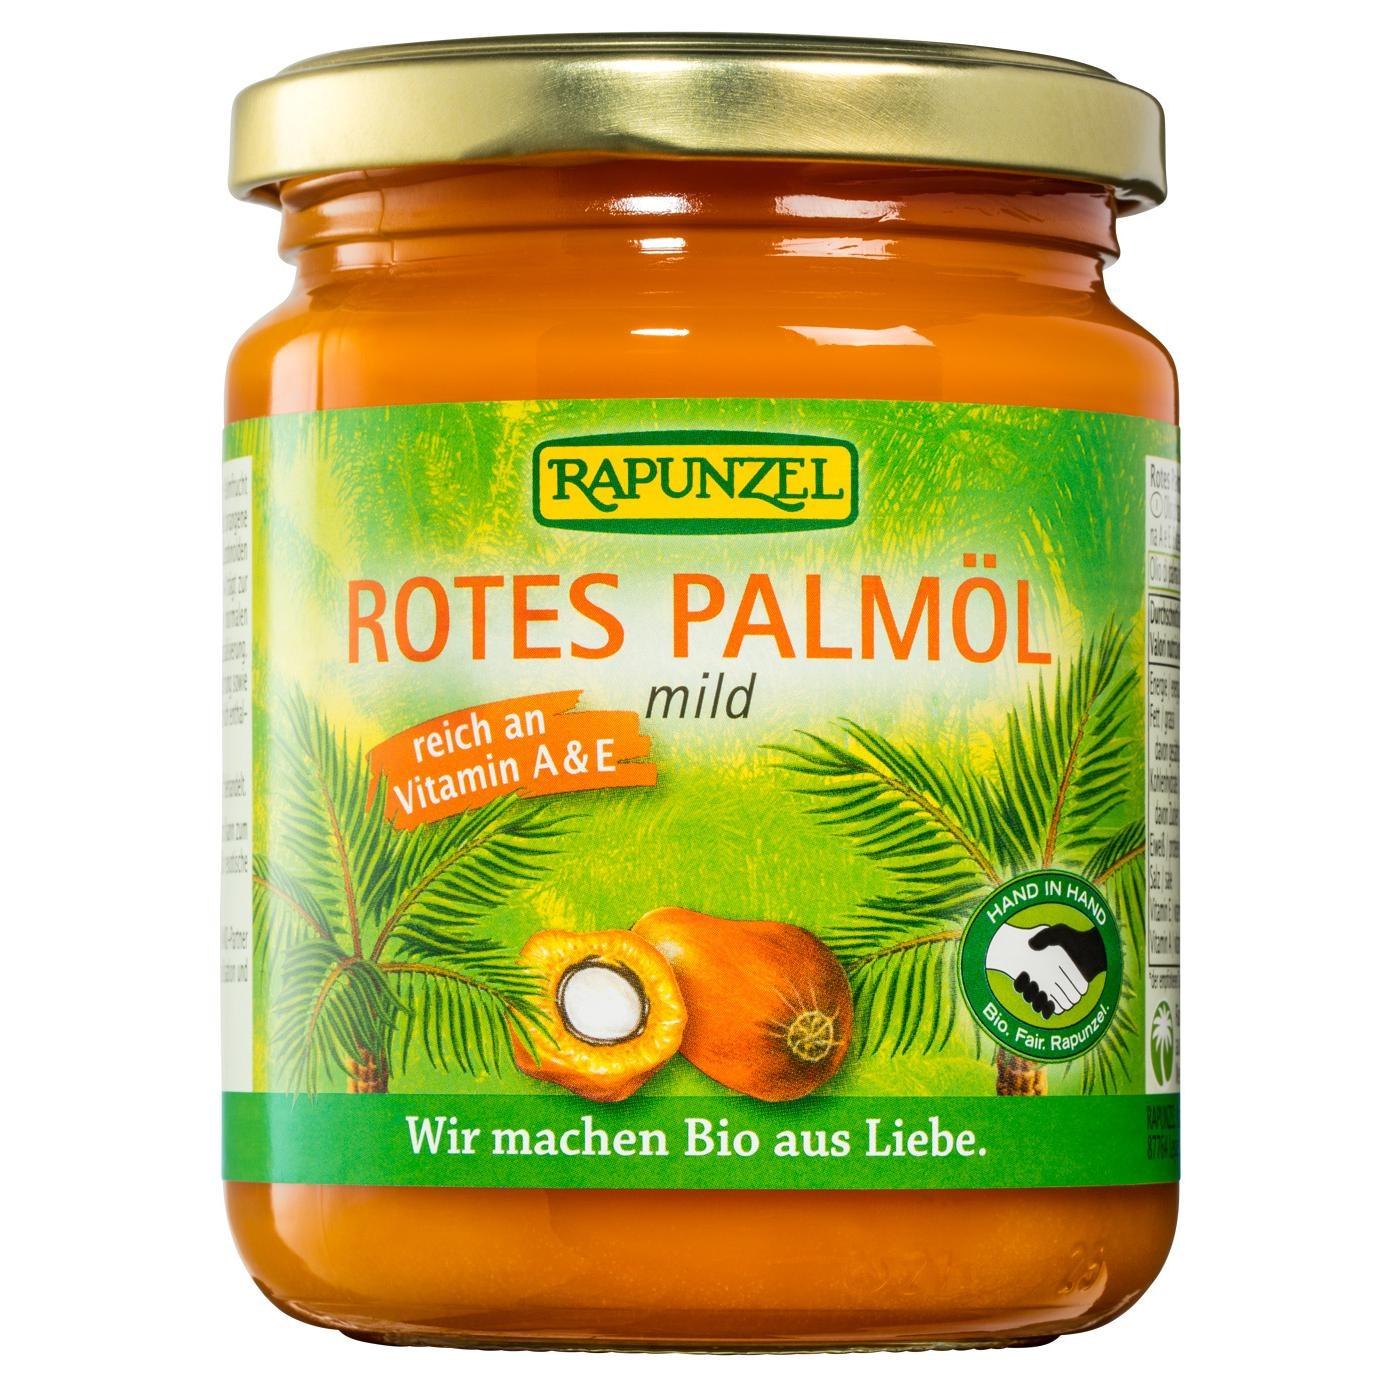 Rapunzel Bio rotes Palmöl mild 200g